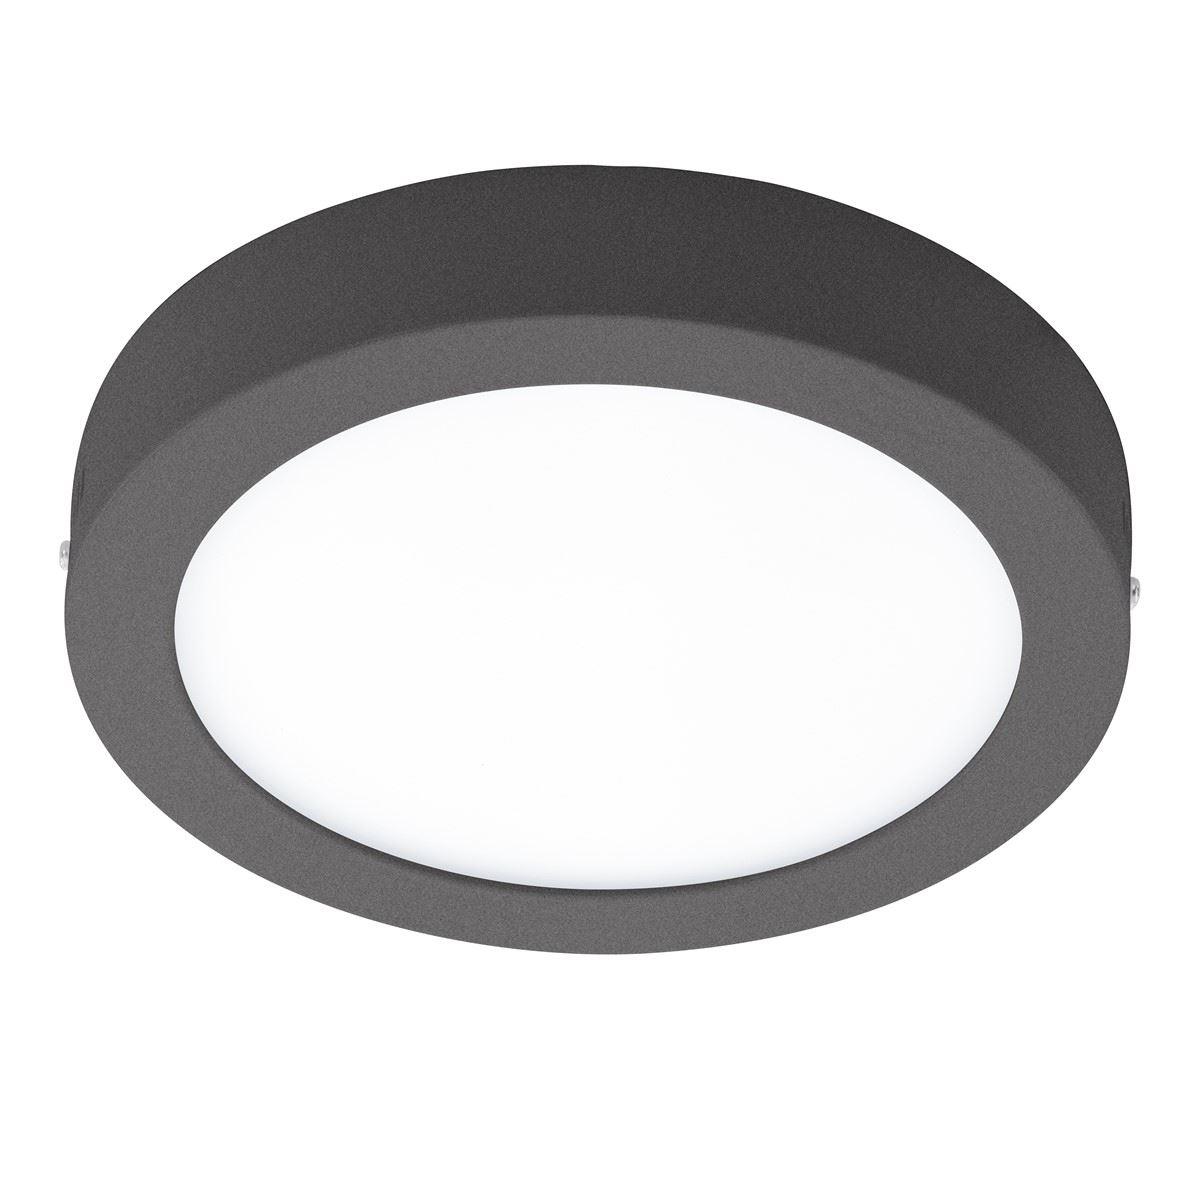 EGLO Round Ceiling Light Argolis Black Led 16,5W Ip44 Cast Aluminum Black